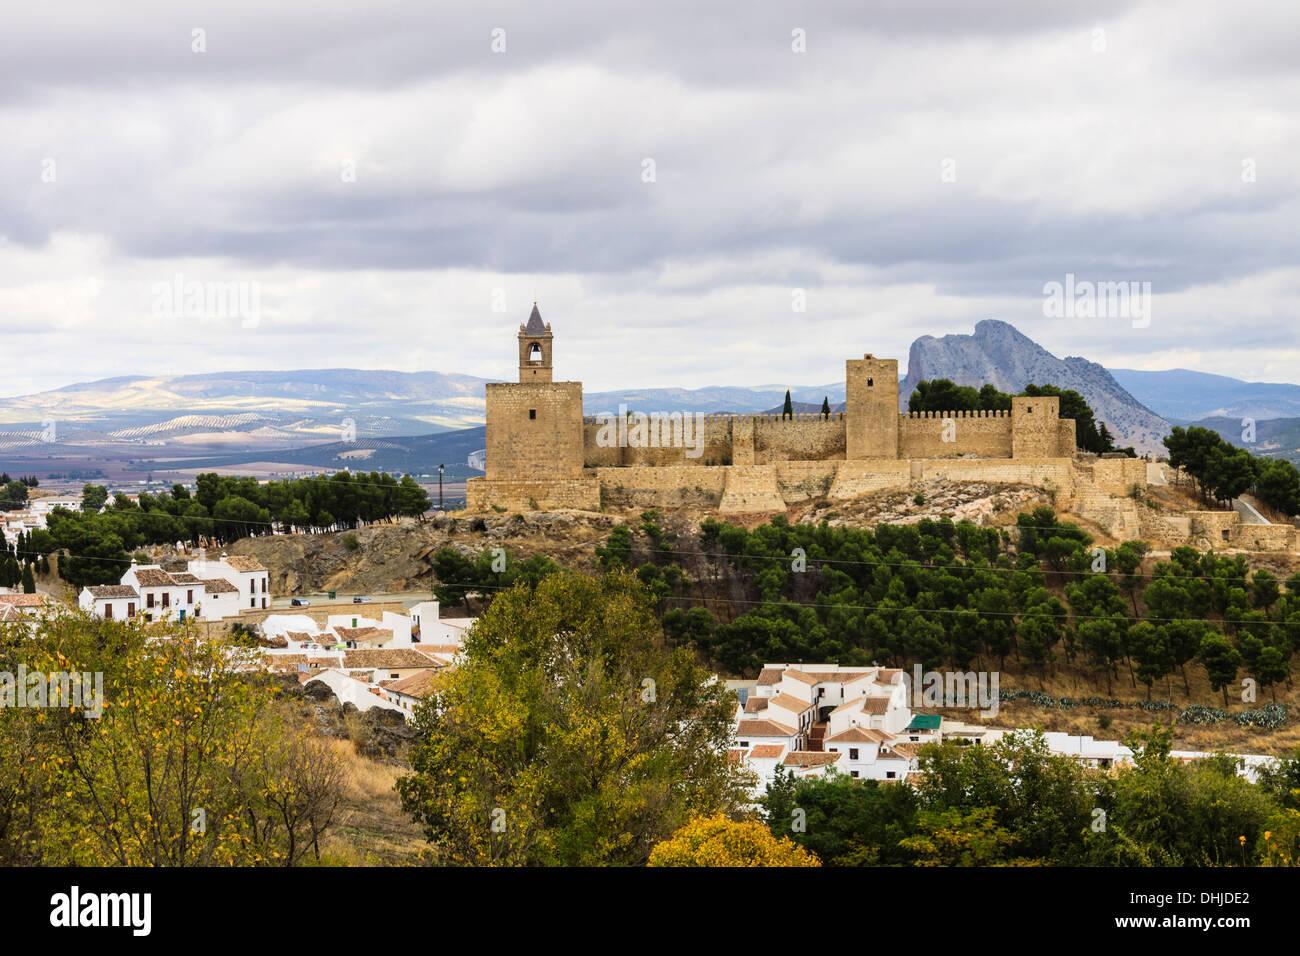 Antequera castle, Malaga province, Andalusia, Spain - Stock Image